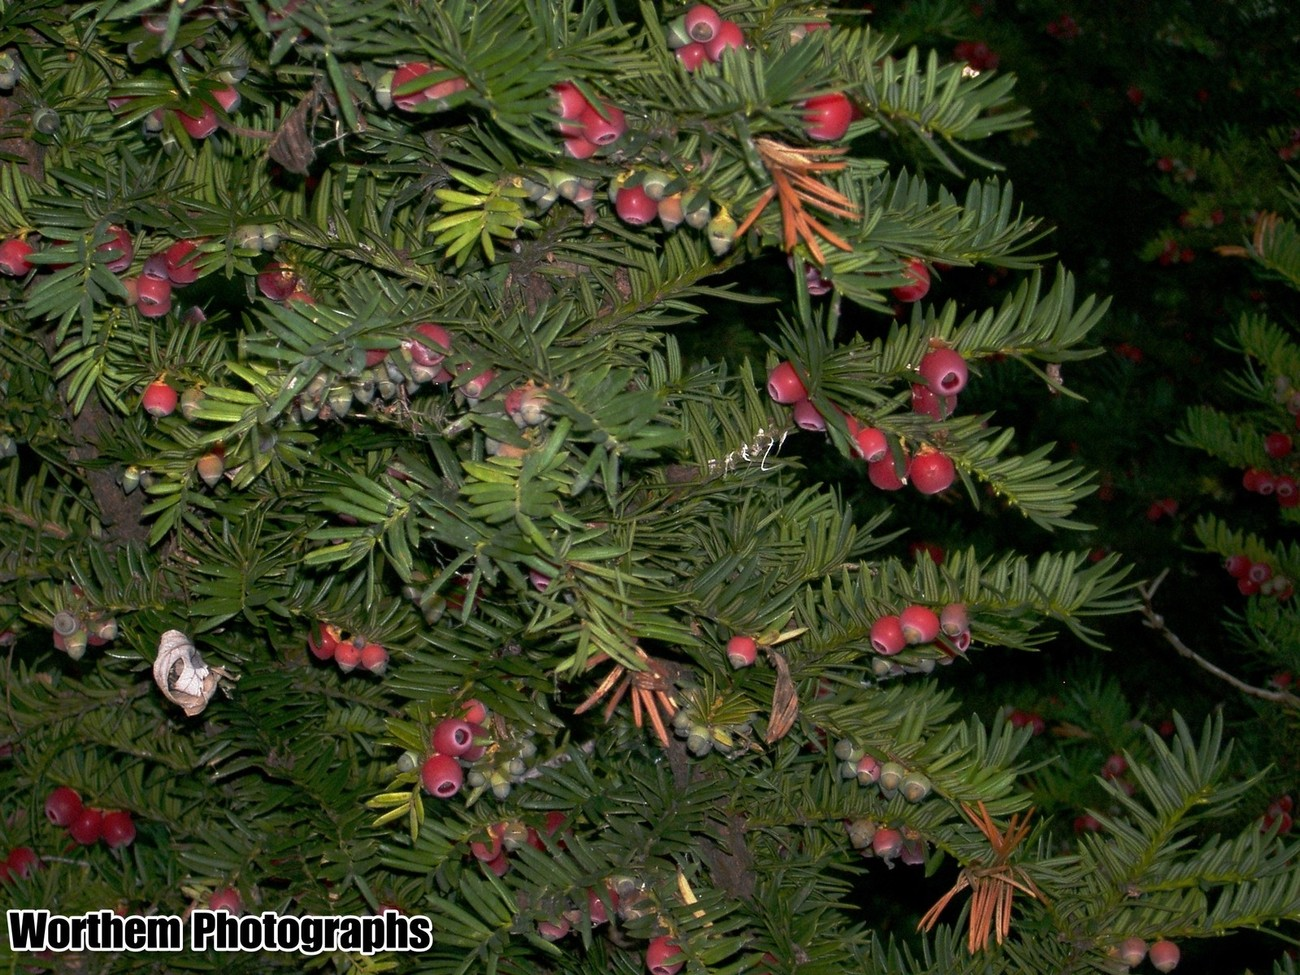 A beautiful pine tree with a festive close up.